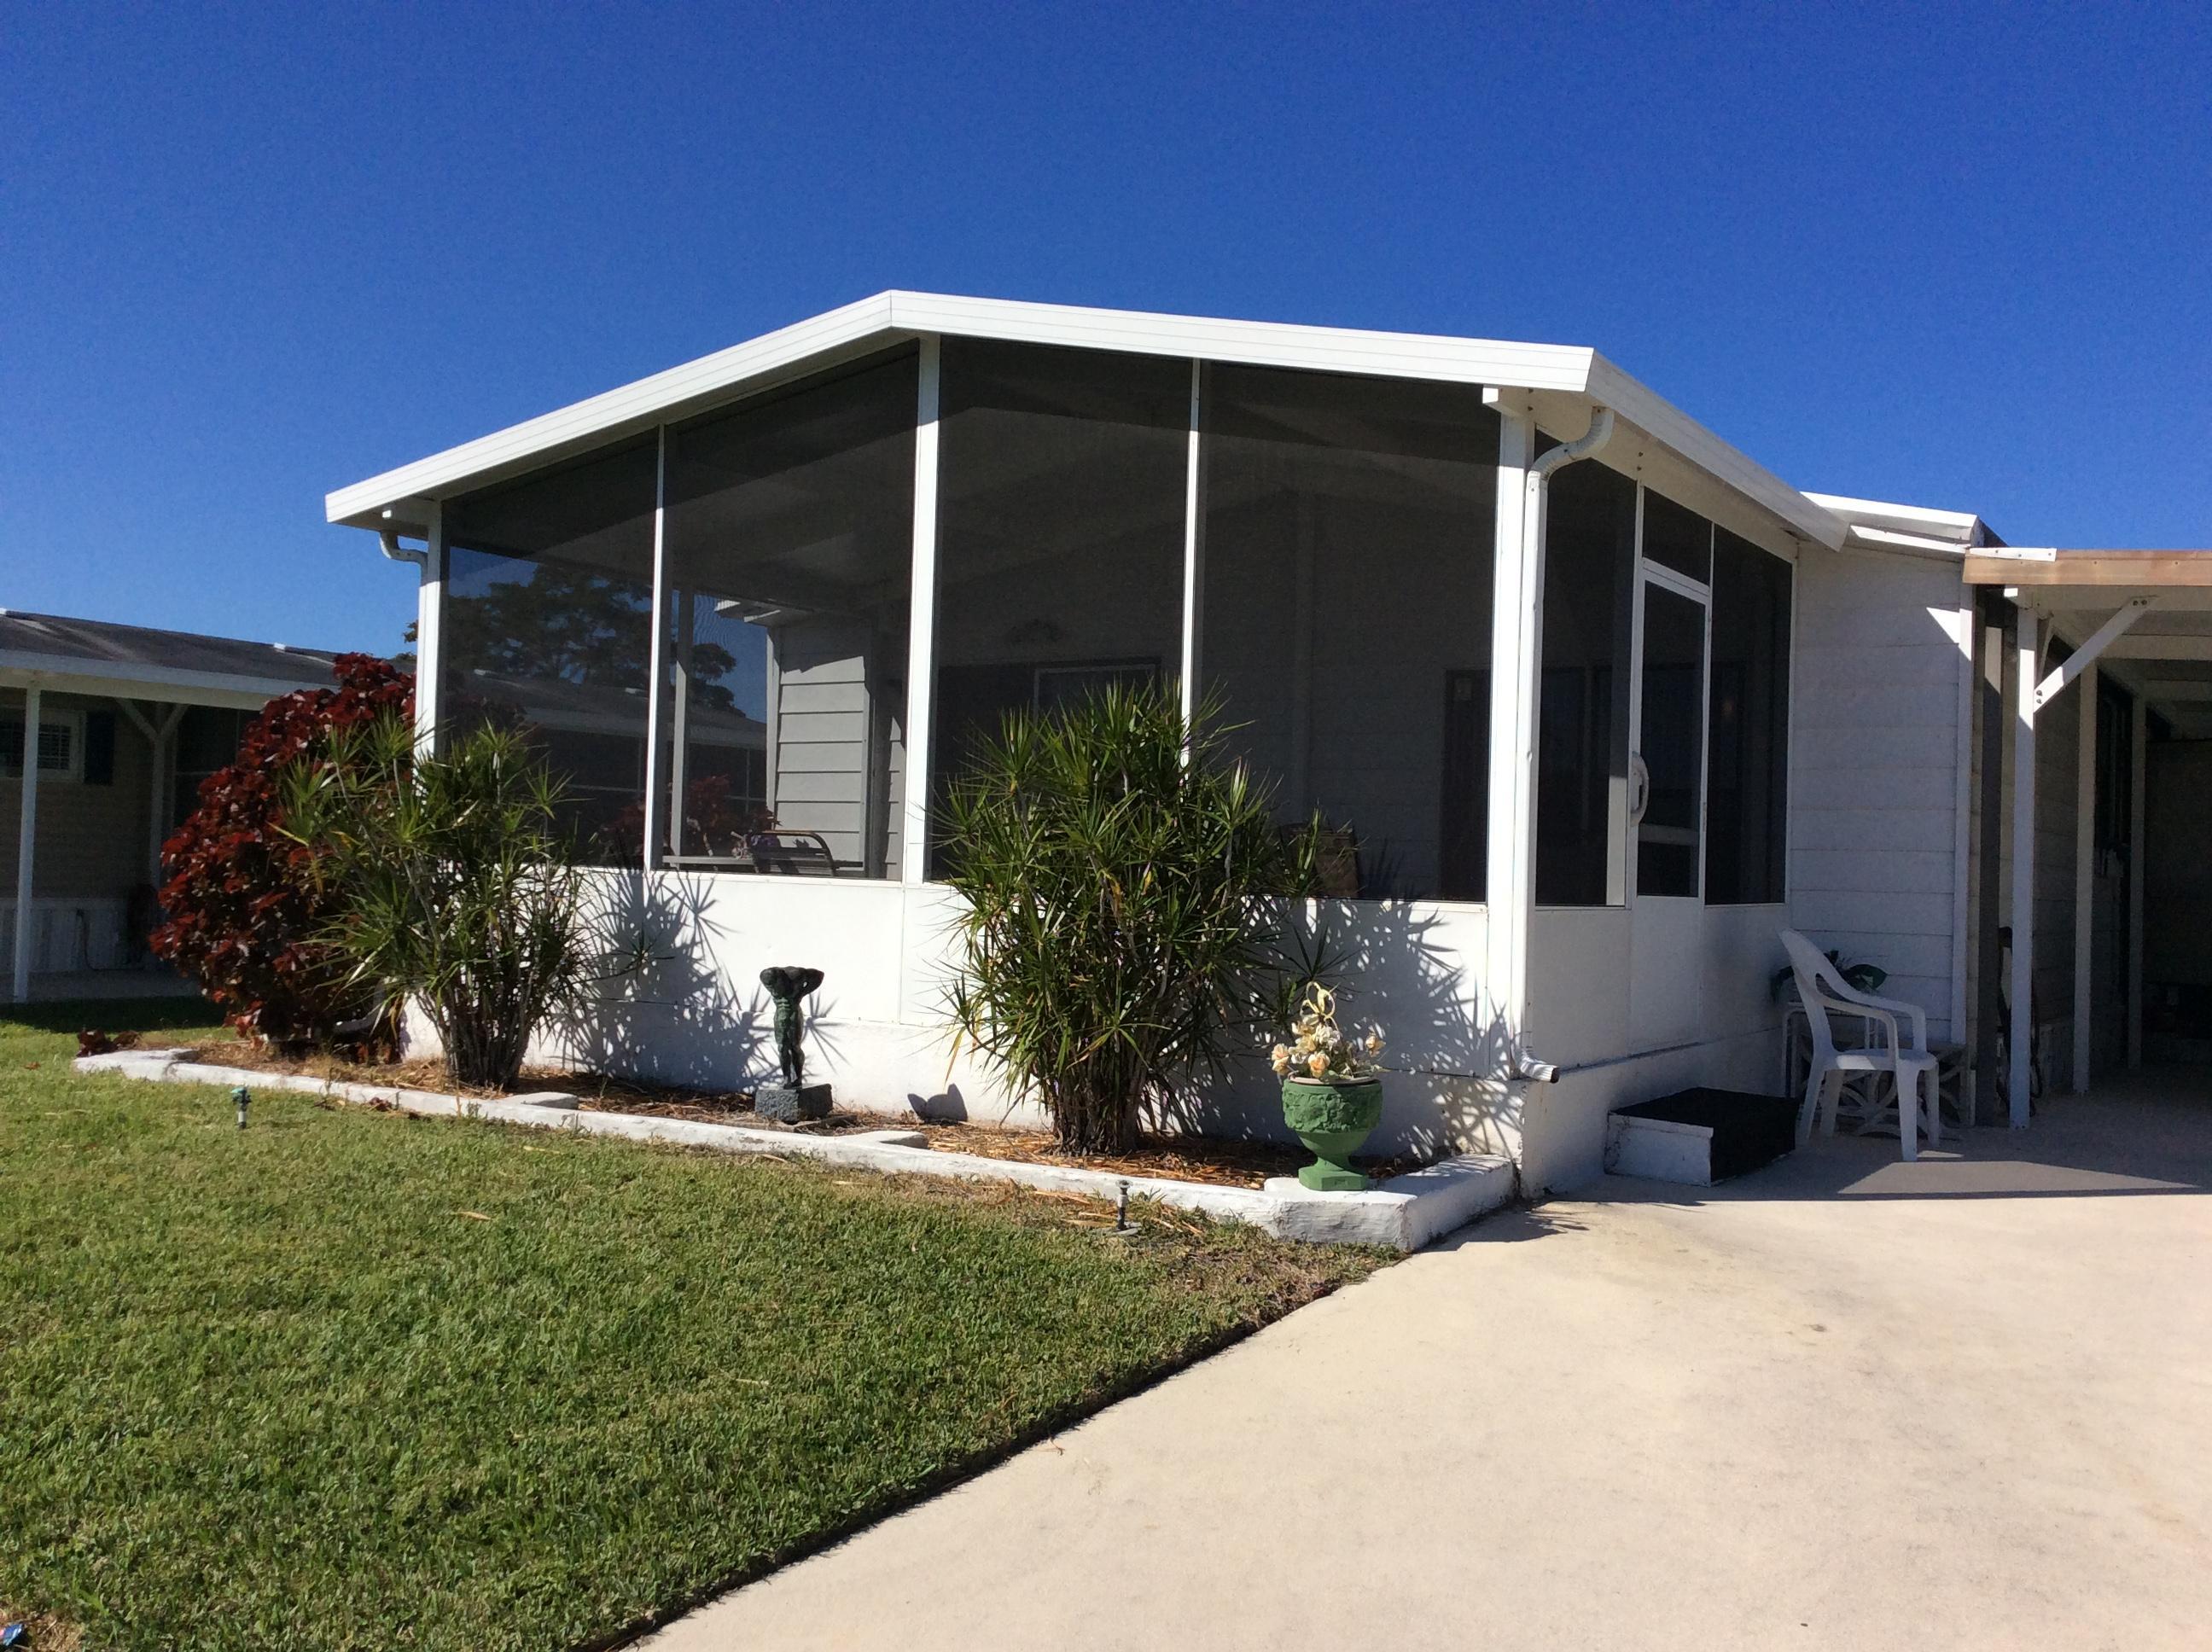 Sandalfoot Cove 19 Properties For Sale Boca Raton 33428